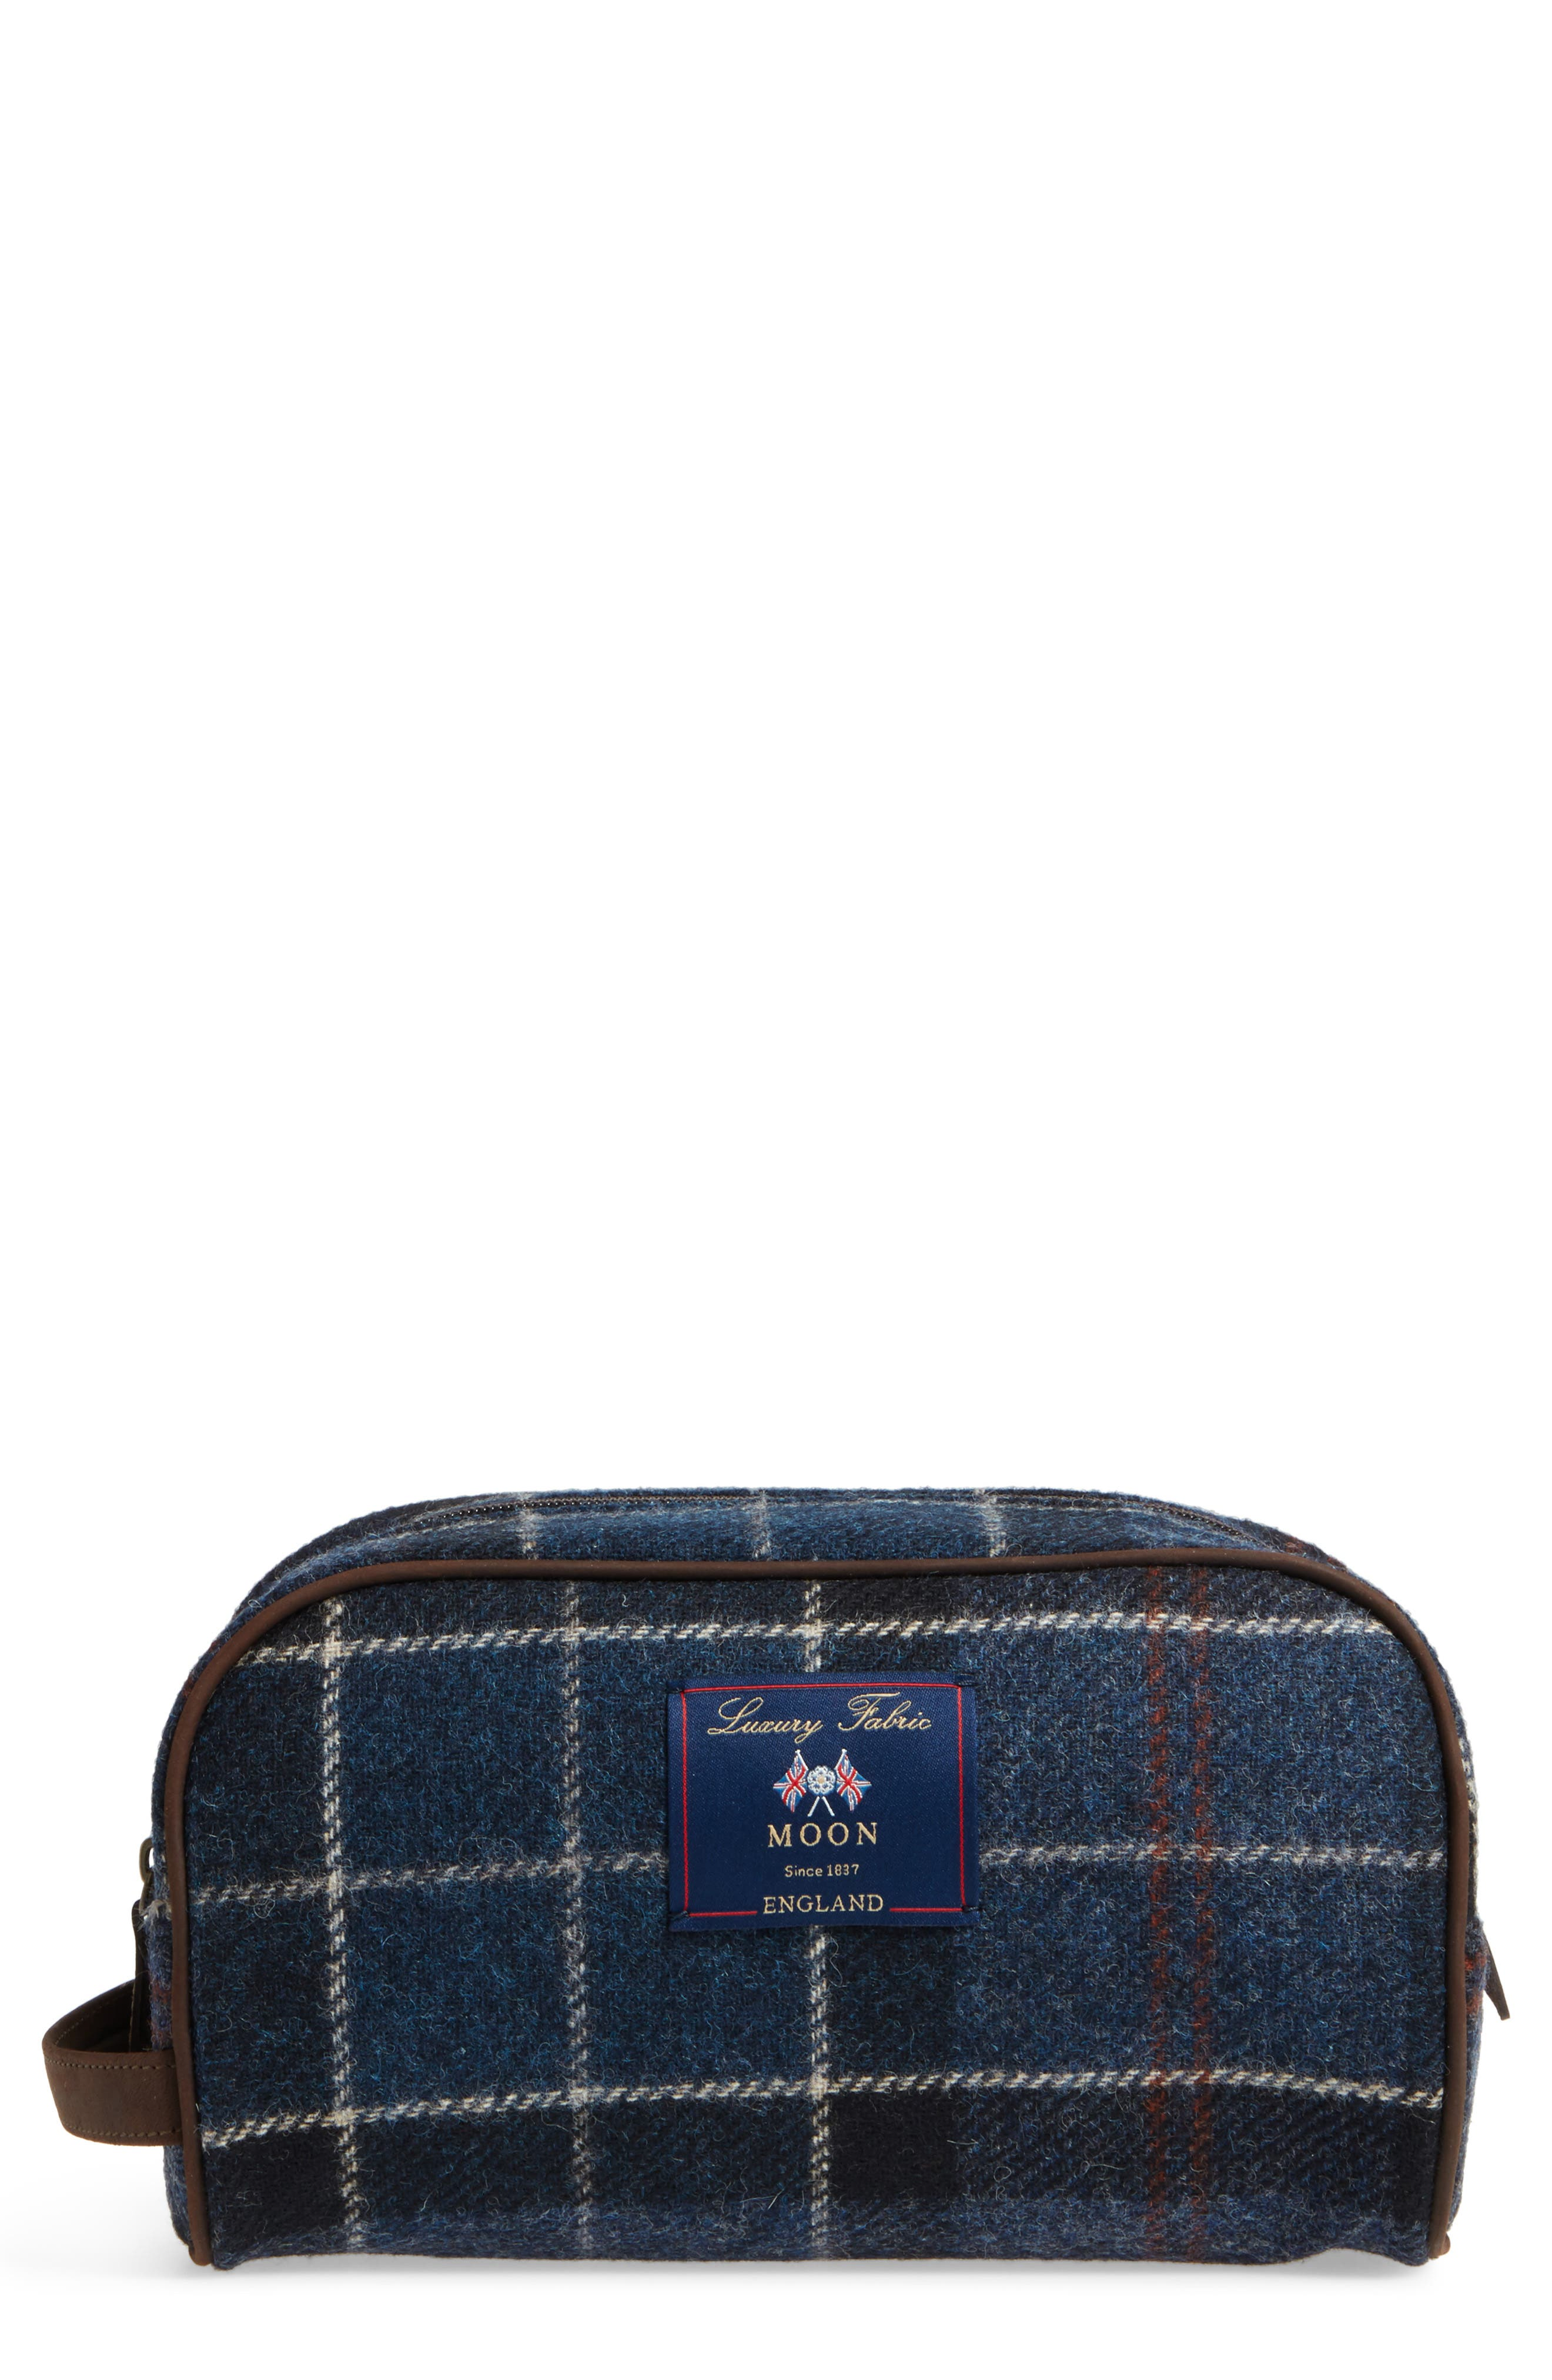 Tartan Dopp Kit,                         Main,                         color, NAVY / RUST TARTAN